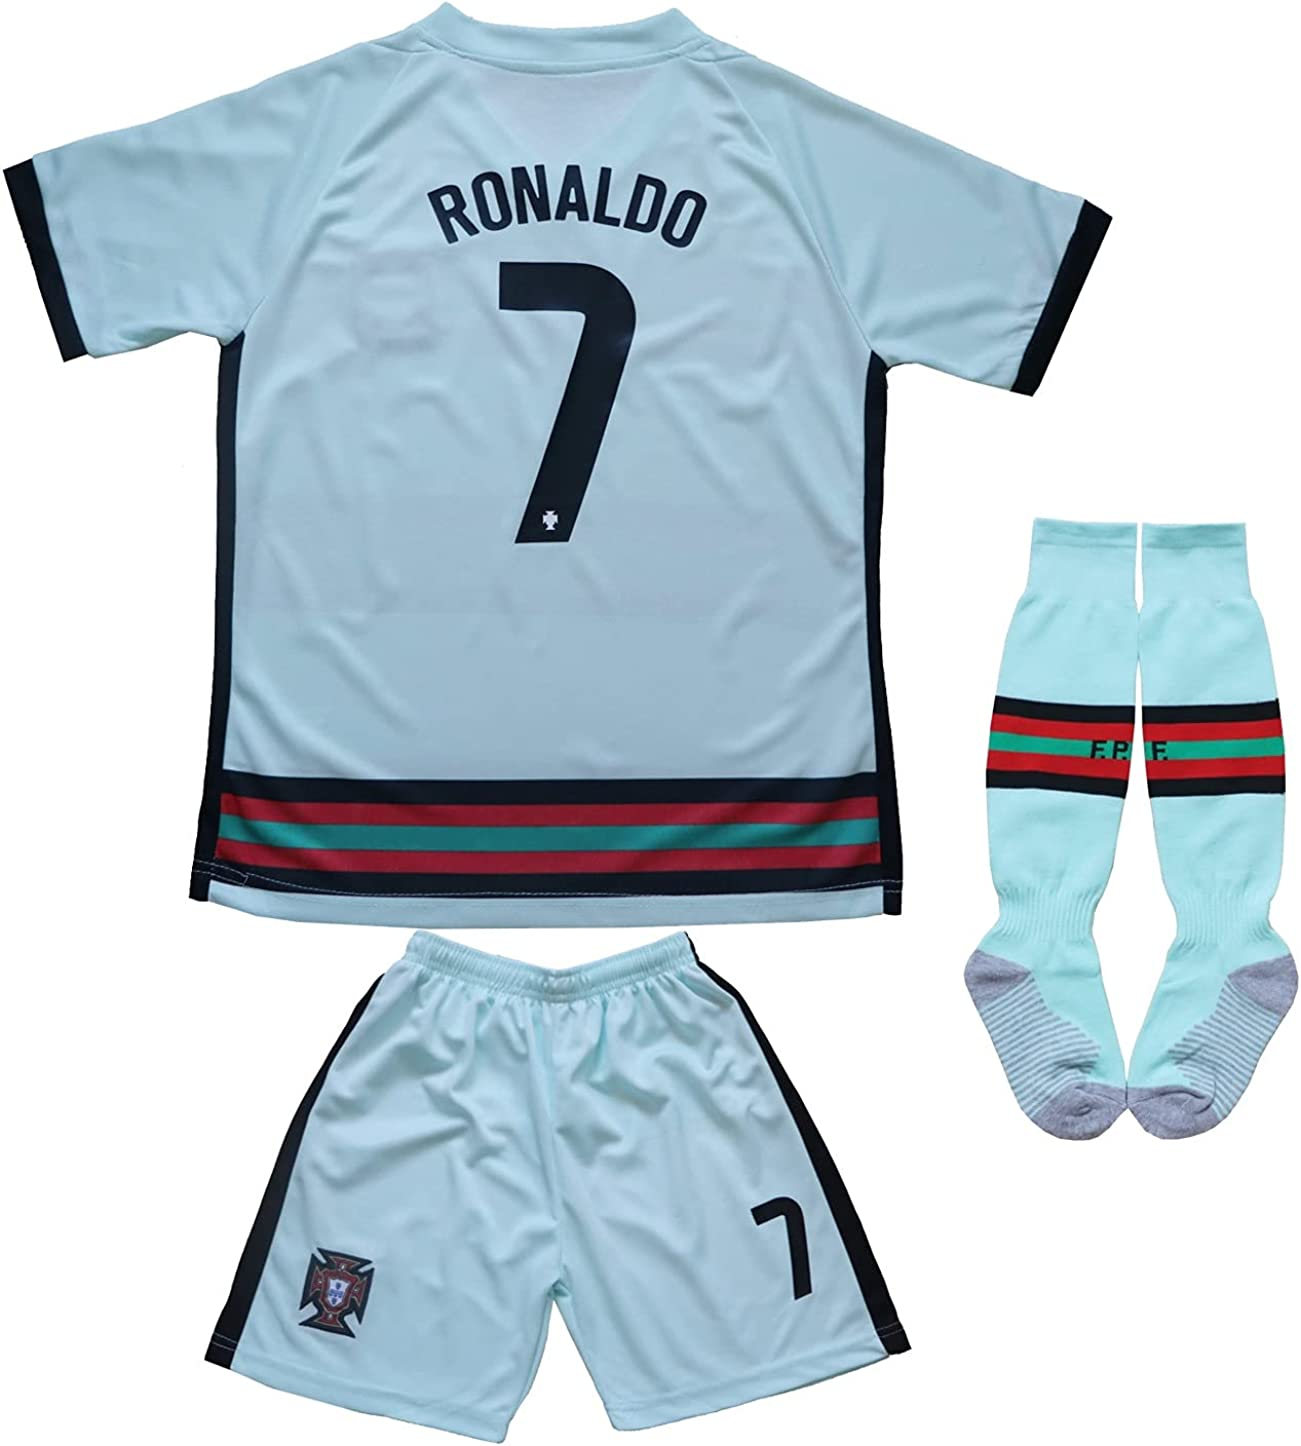 FPF 2021 Portugal #7 Cristiano Ronaldo Football Rare Soccer Jers Kids NEW before selling